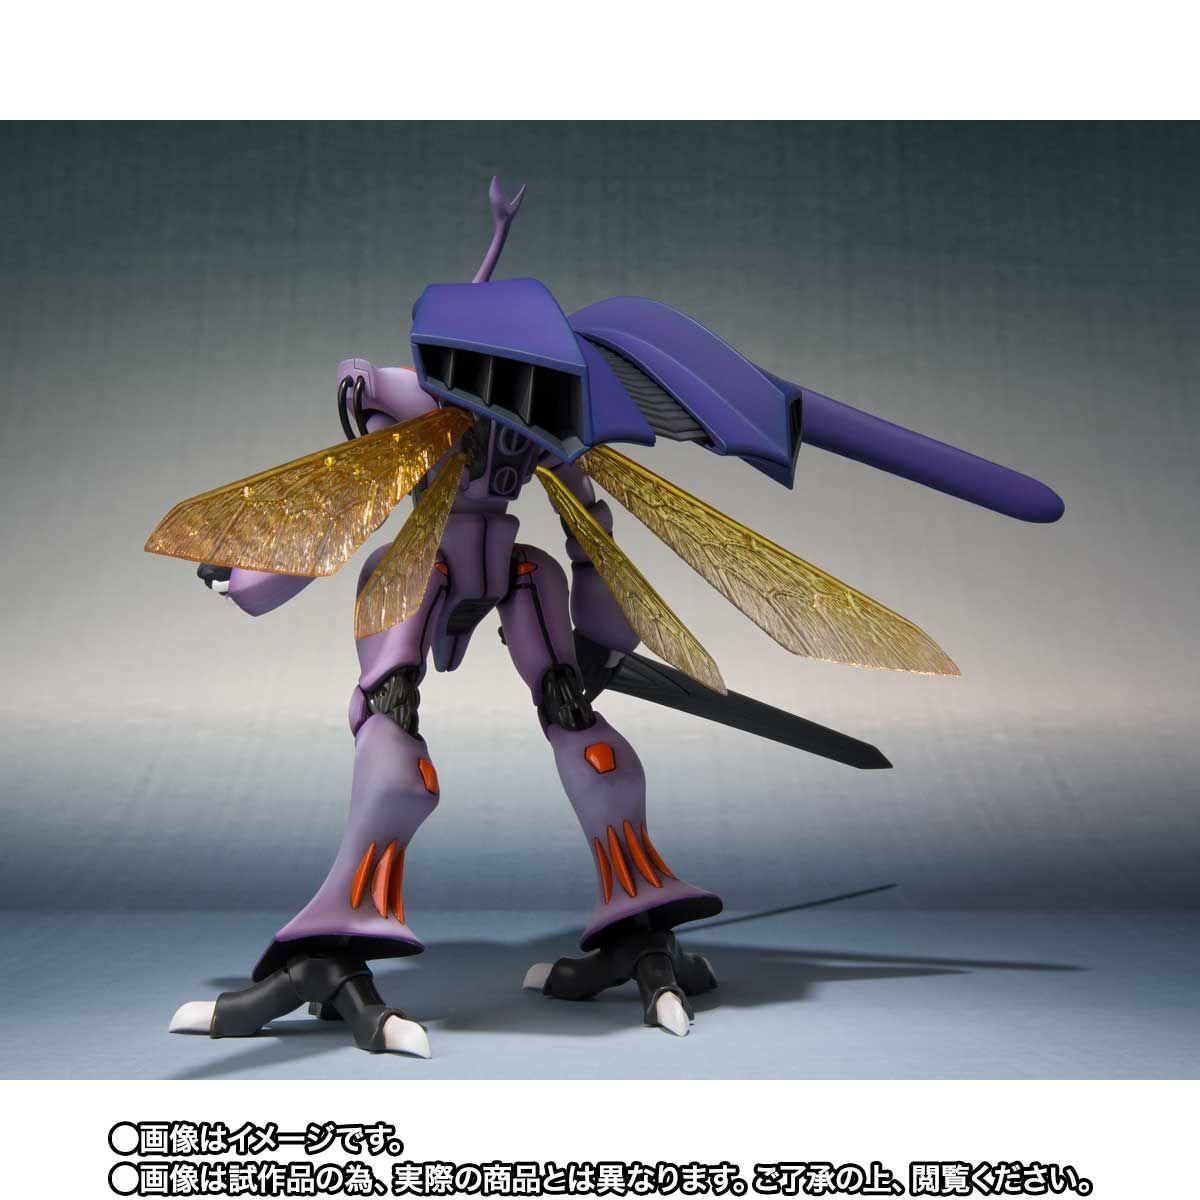 ROBOT魂 ダンバイン SHADOW FINISH09